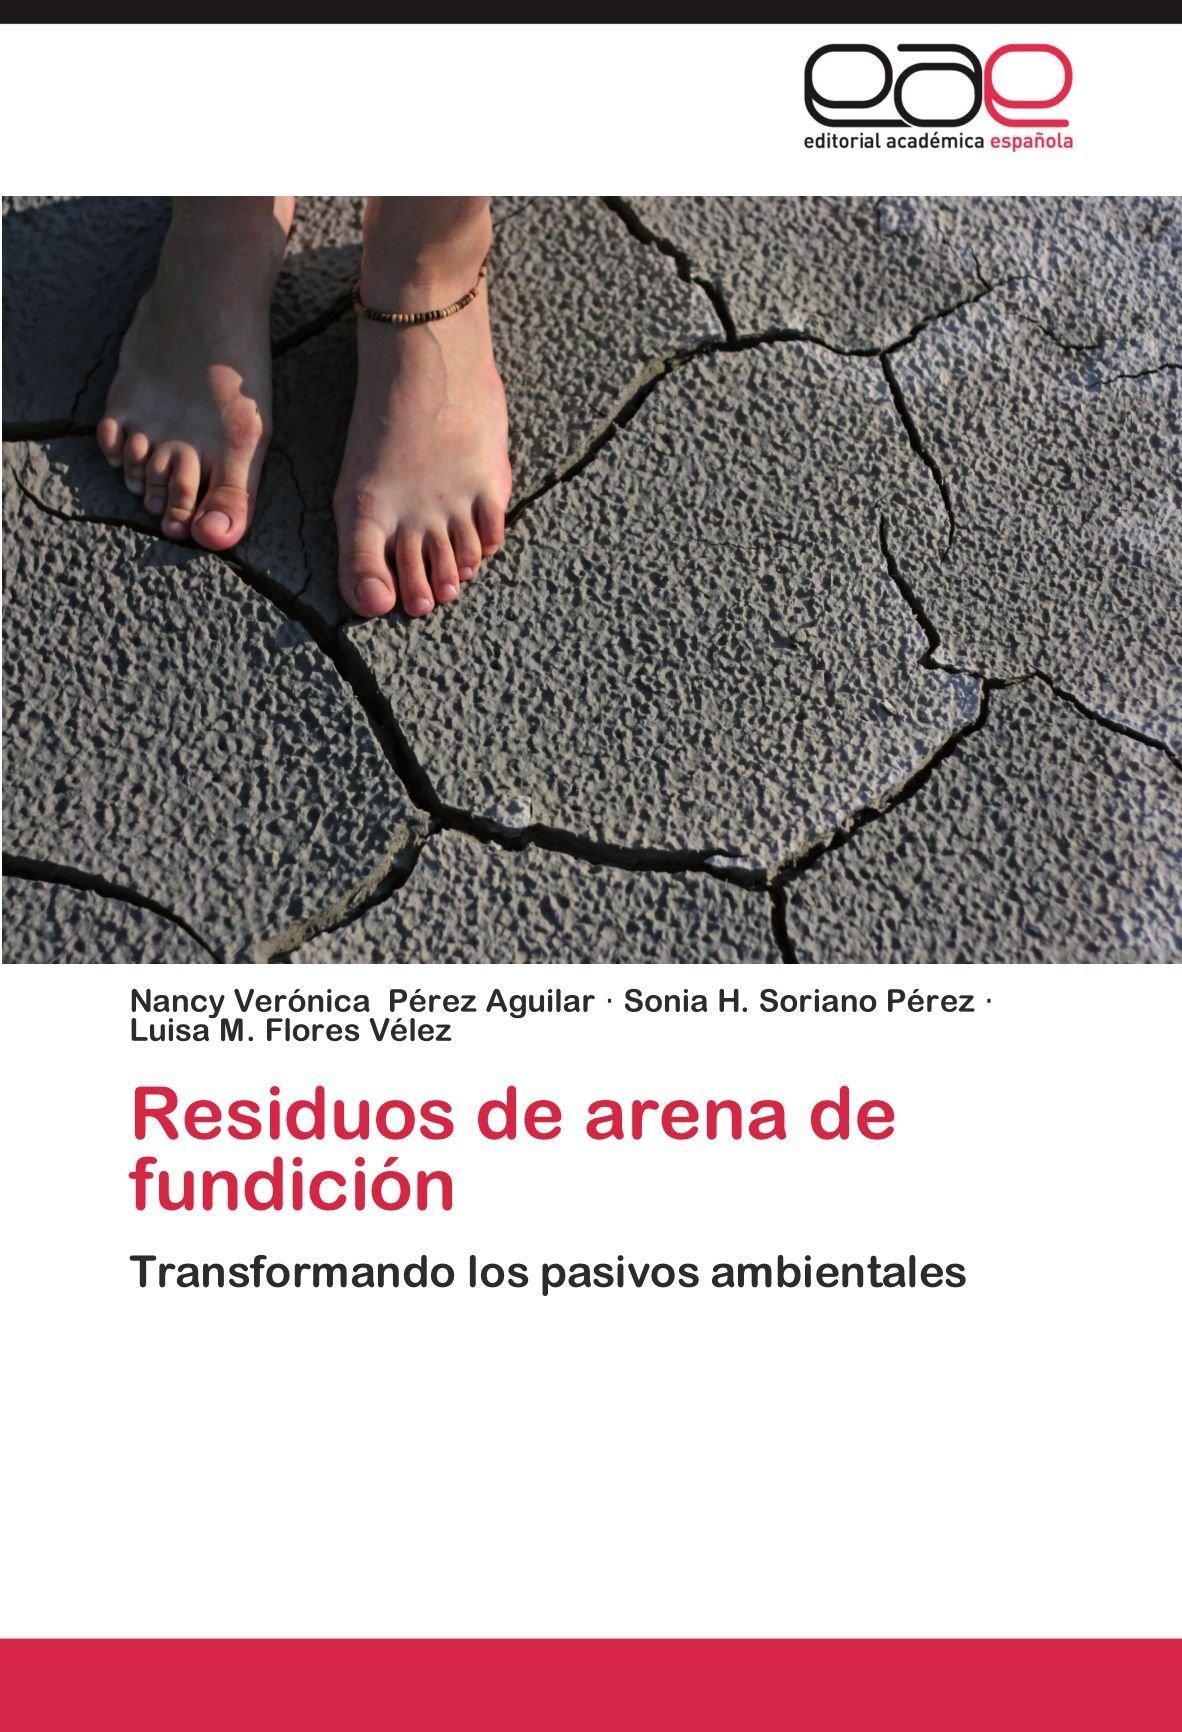 Residuos de Arena de Fundicion: Amazon.es: Nancy Ver P. Rez Aguilar, Sonia H. Soriano P. Rez, Luisa M. Flores V. Lez: Libros